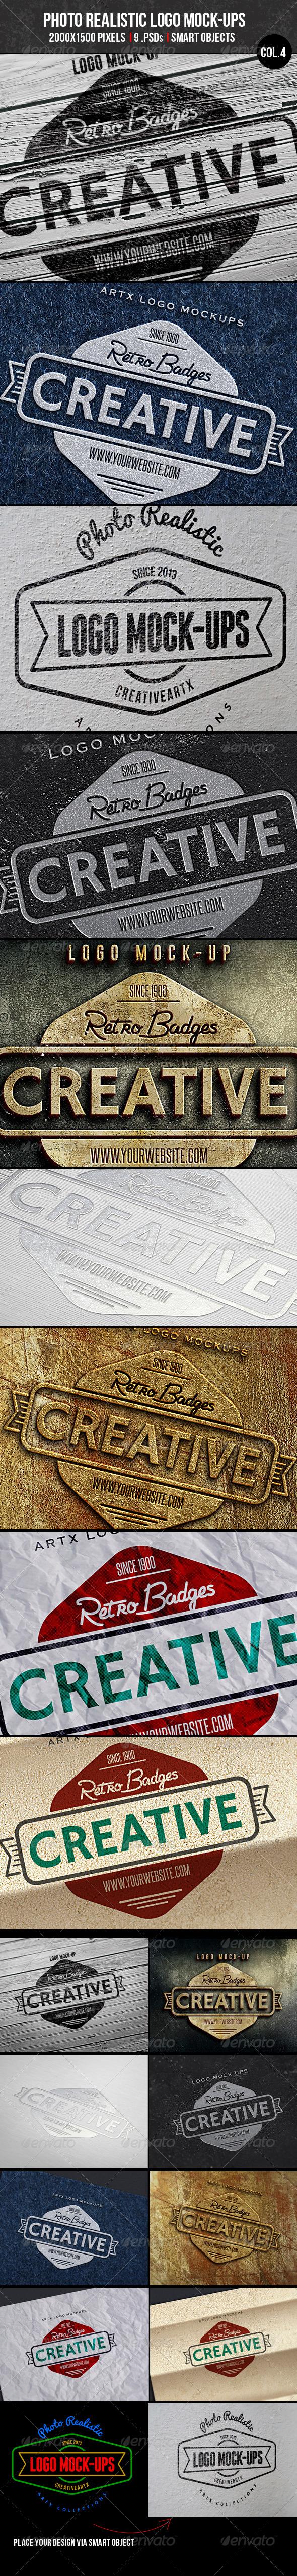 GraphicRiver Photorealistic Logo Mock-Ups Col.4 6635423